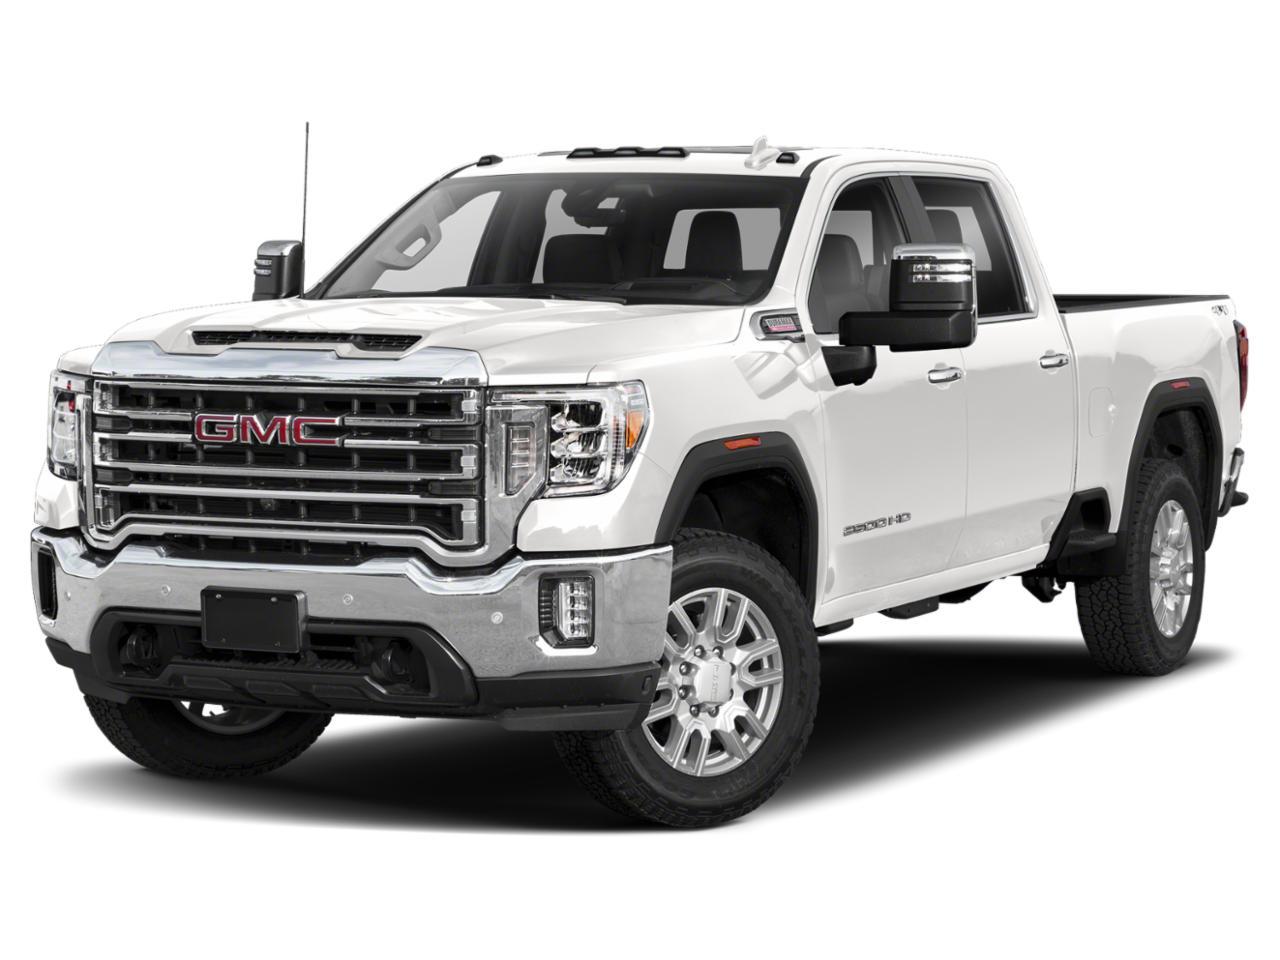 2021 GMC Sierra 2500HD Vehicle Photo in Dallas, TX 75209